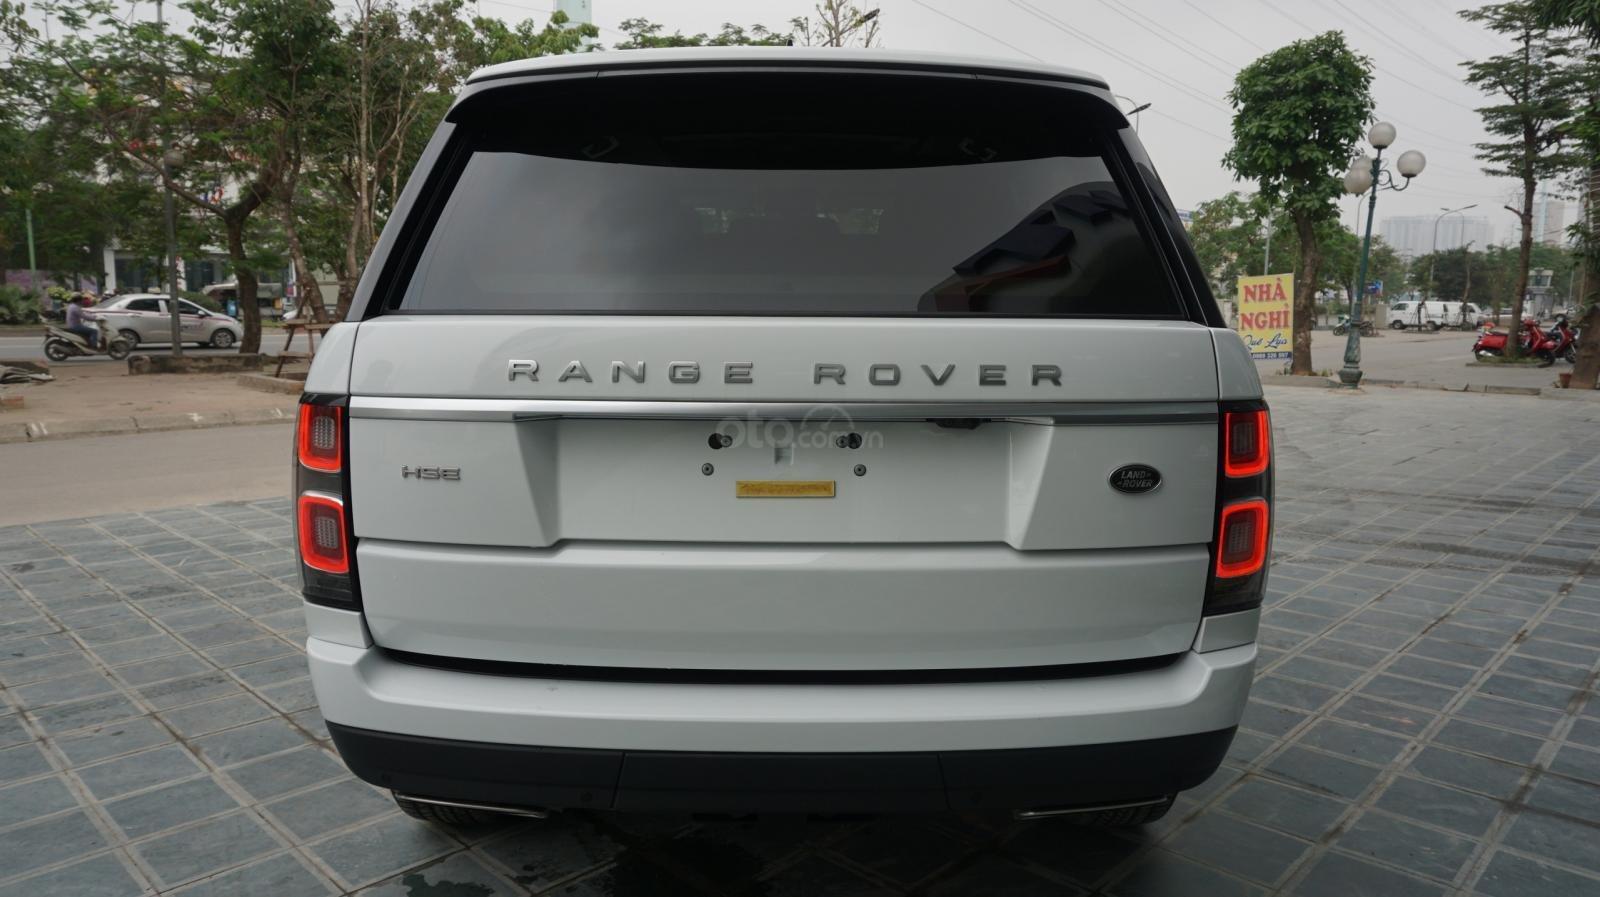 Cần bán xe LandRover Range Rover HSE năm 2019, màu trắng, xe nhập-11